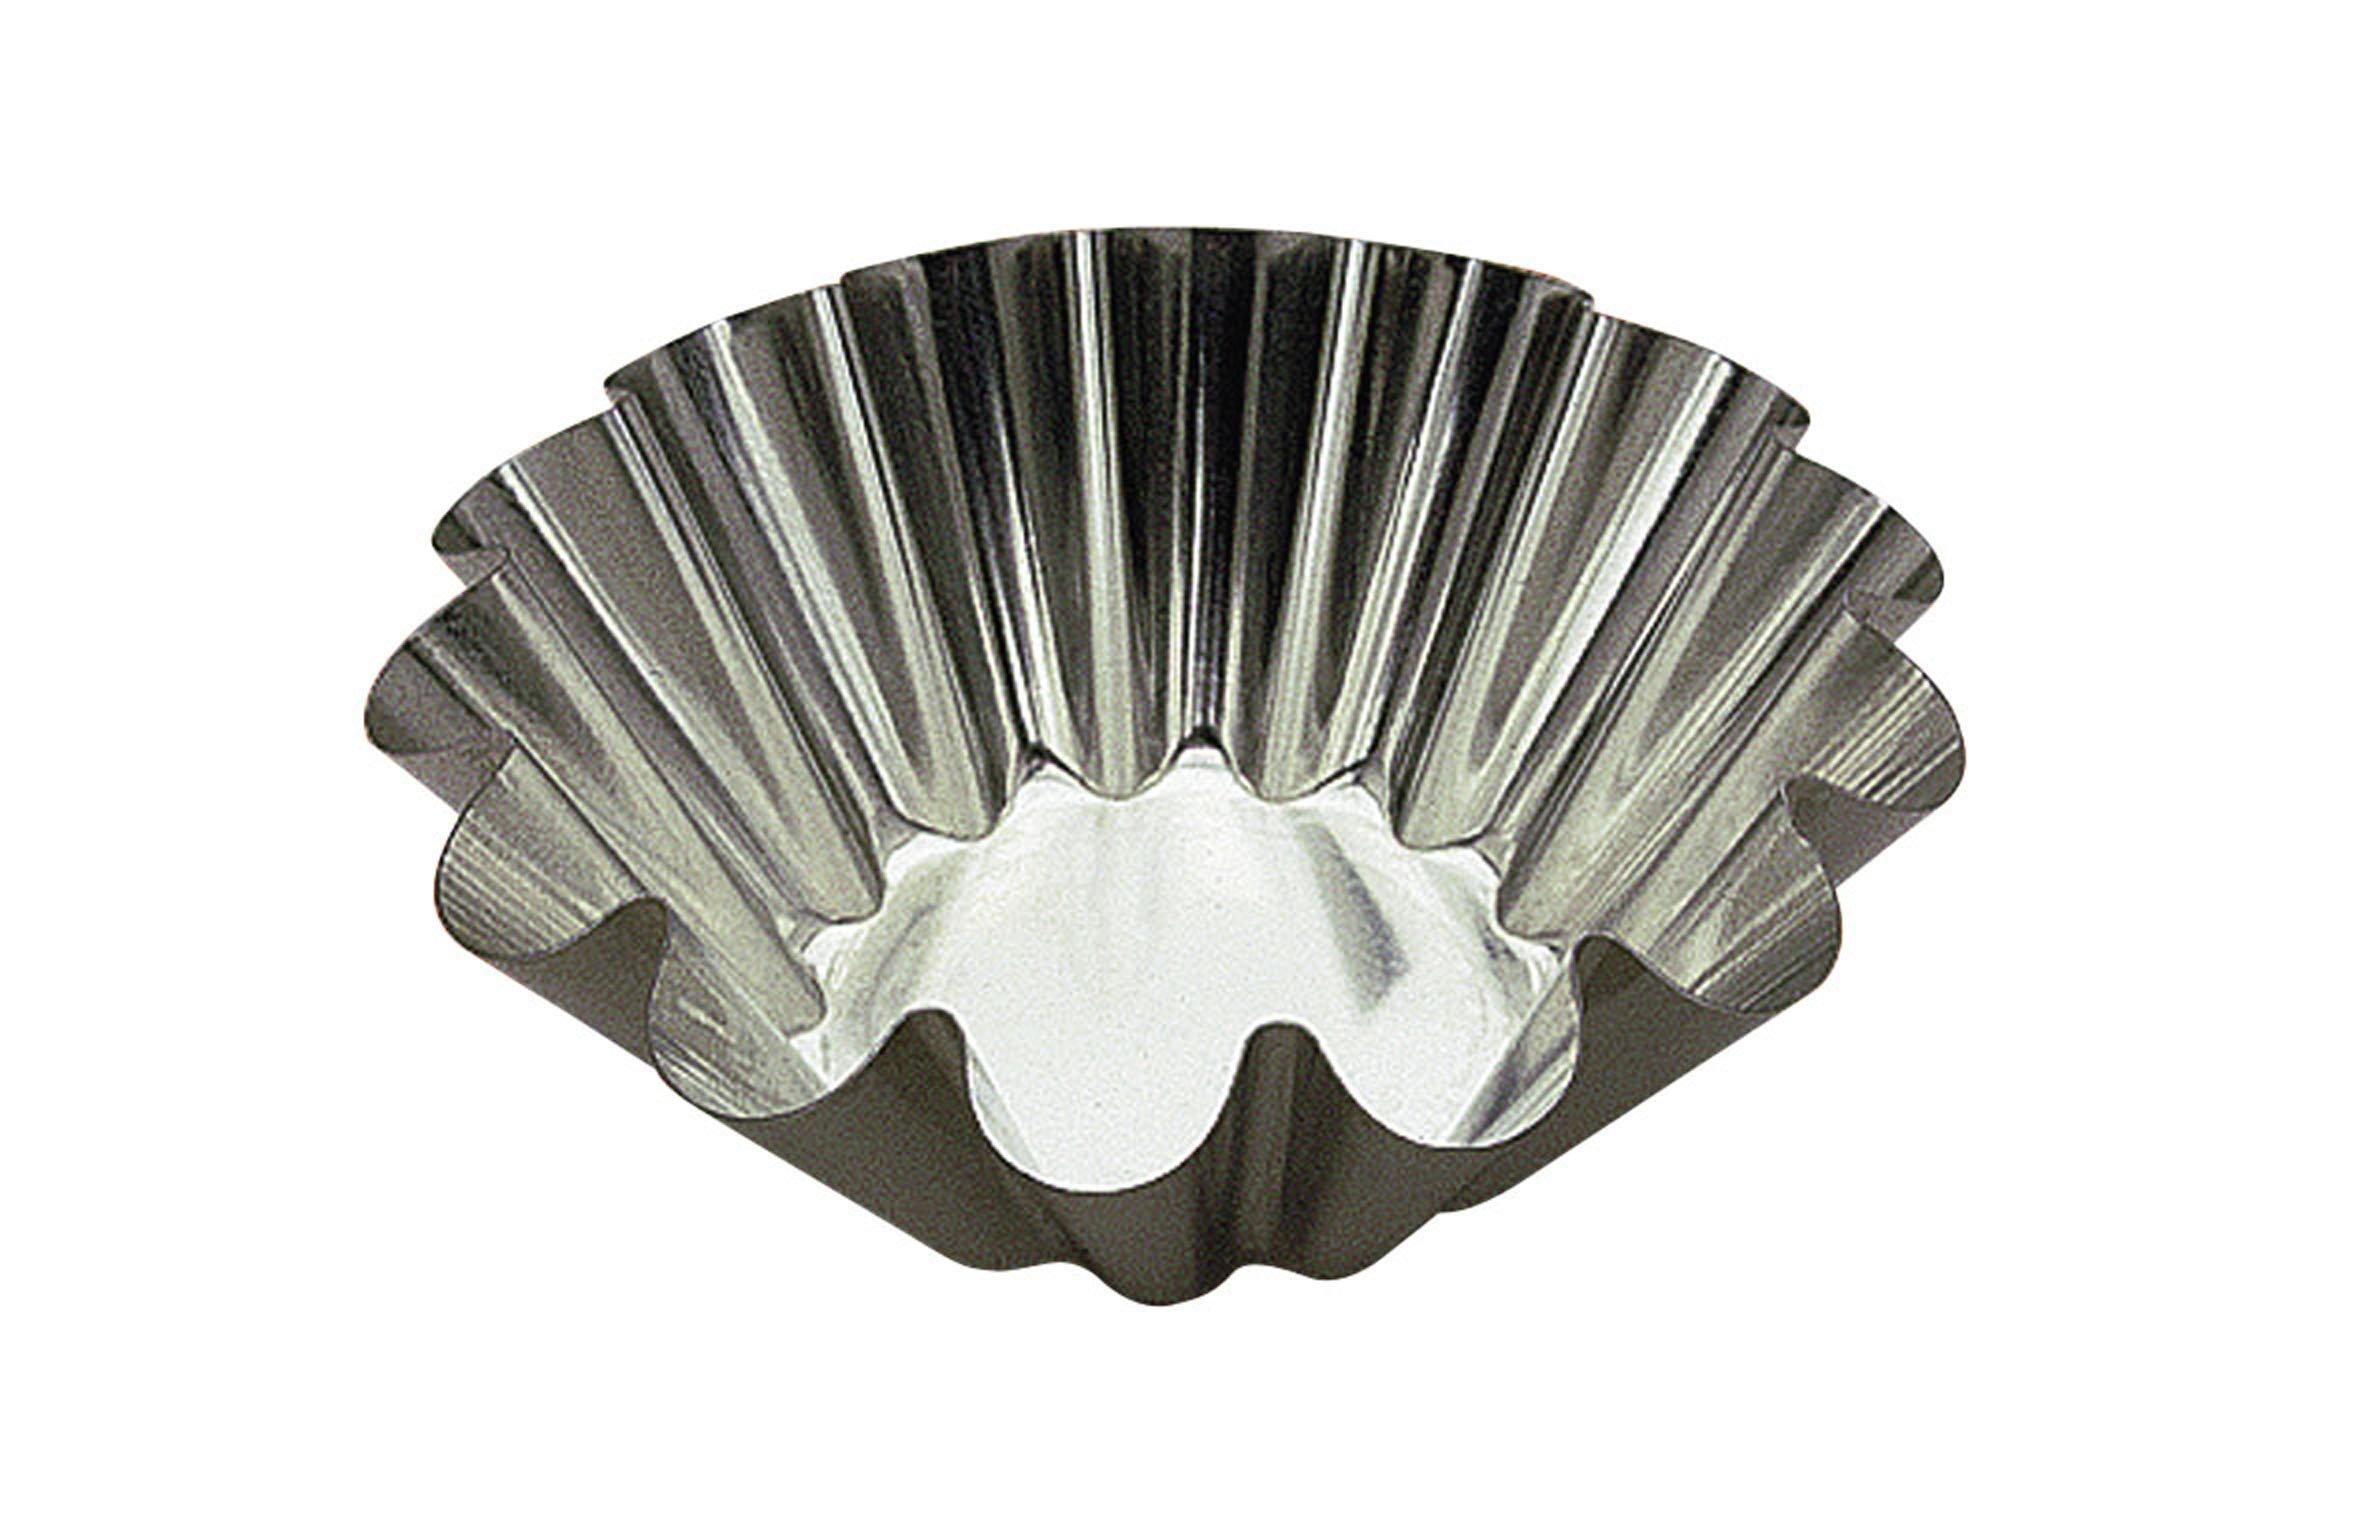 Gobel 4-Cup Brioche Mold, 8-Inch